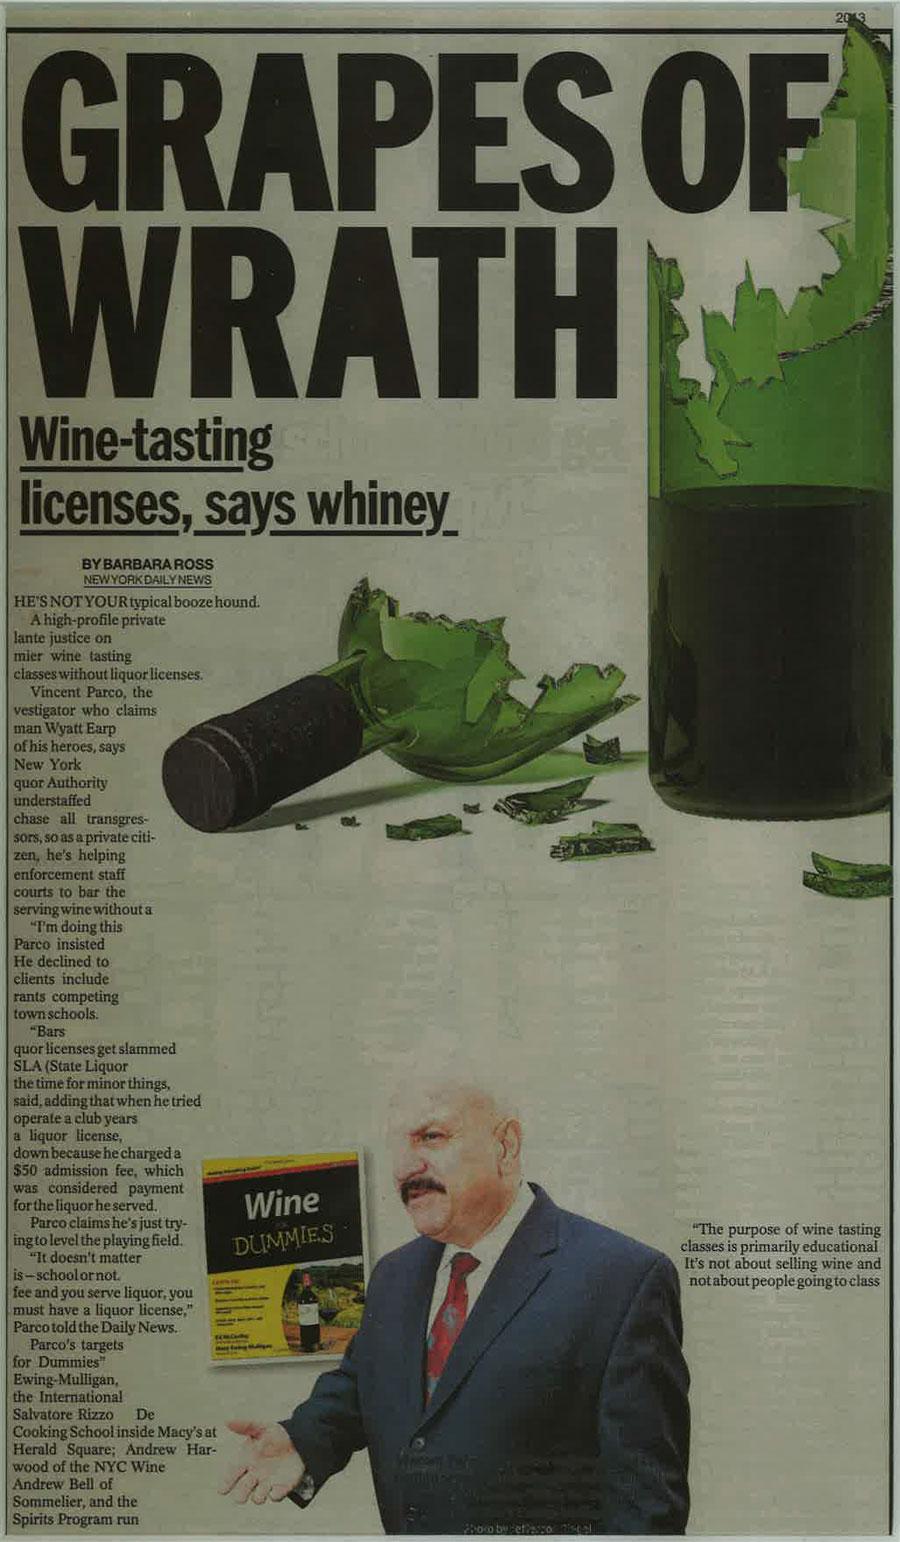 Grapesof-Wrath